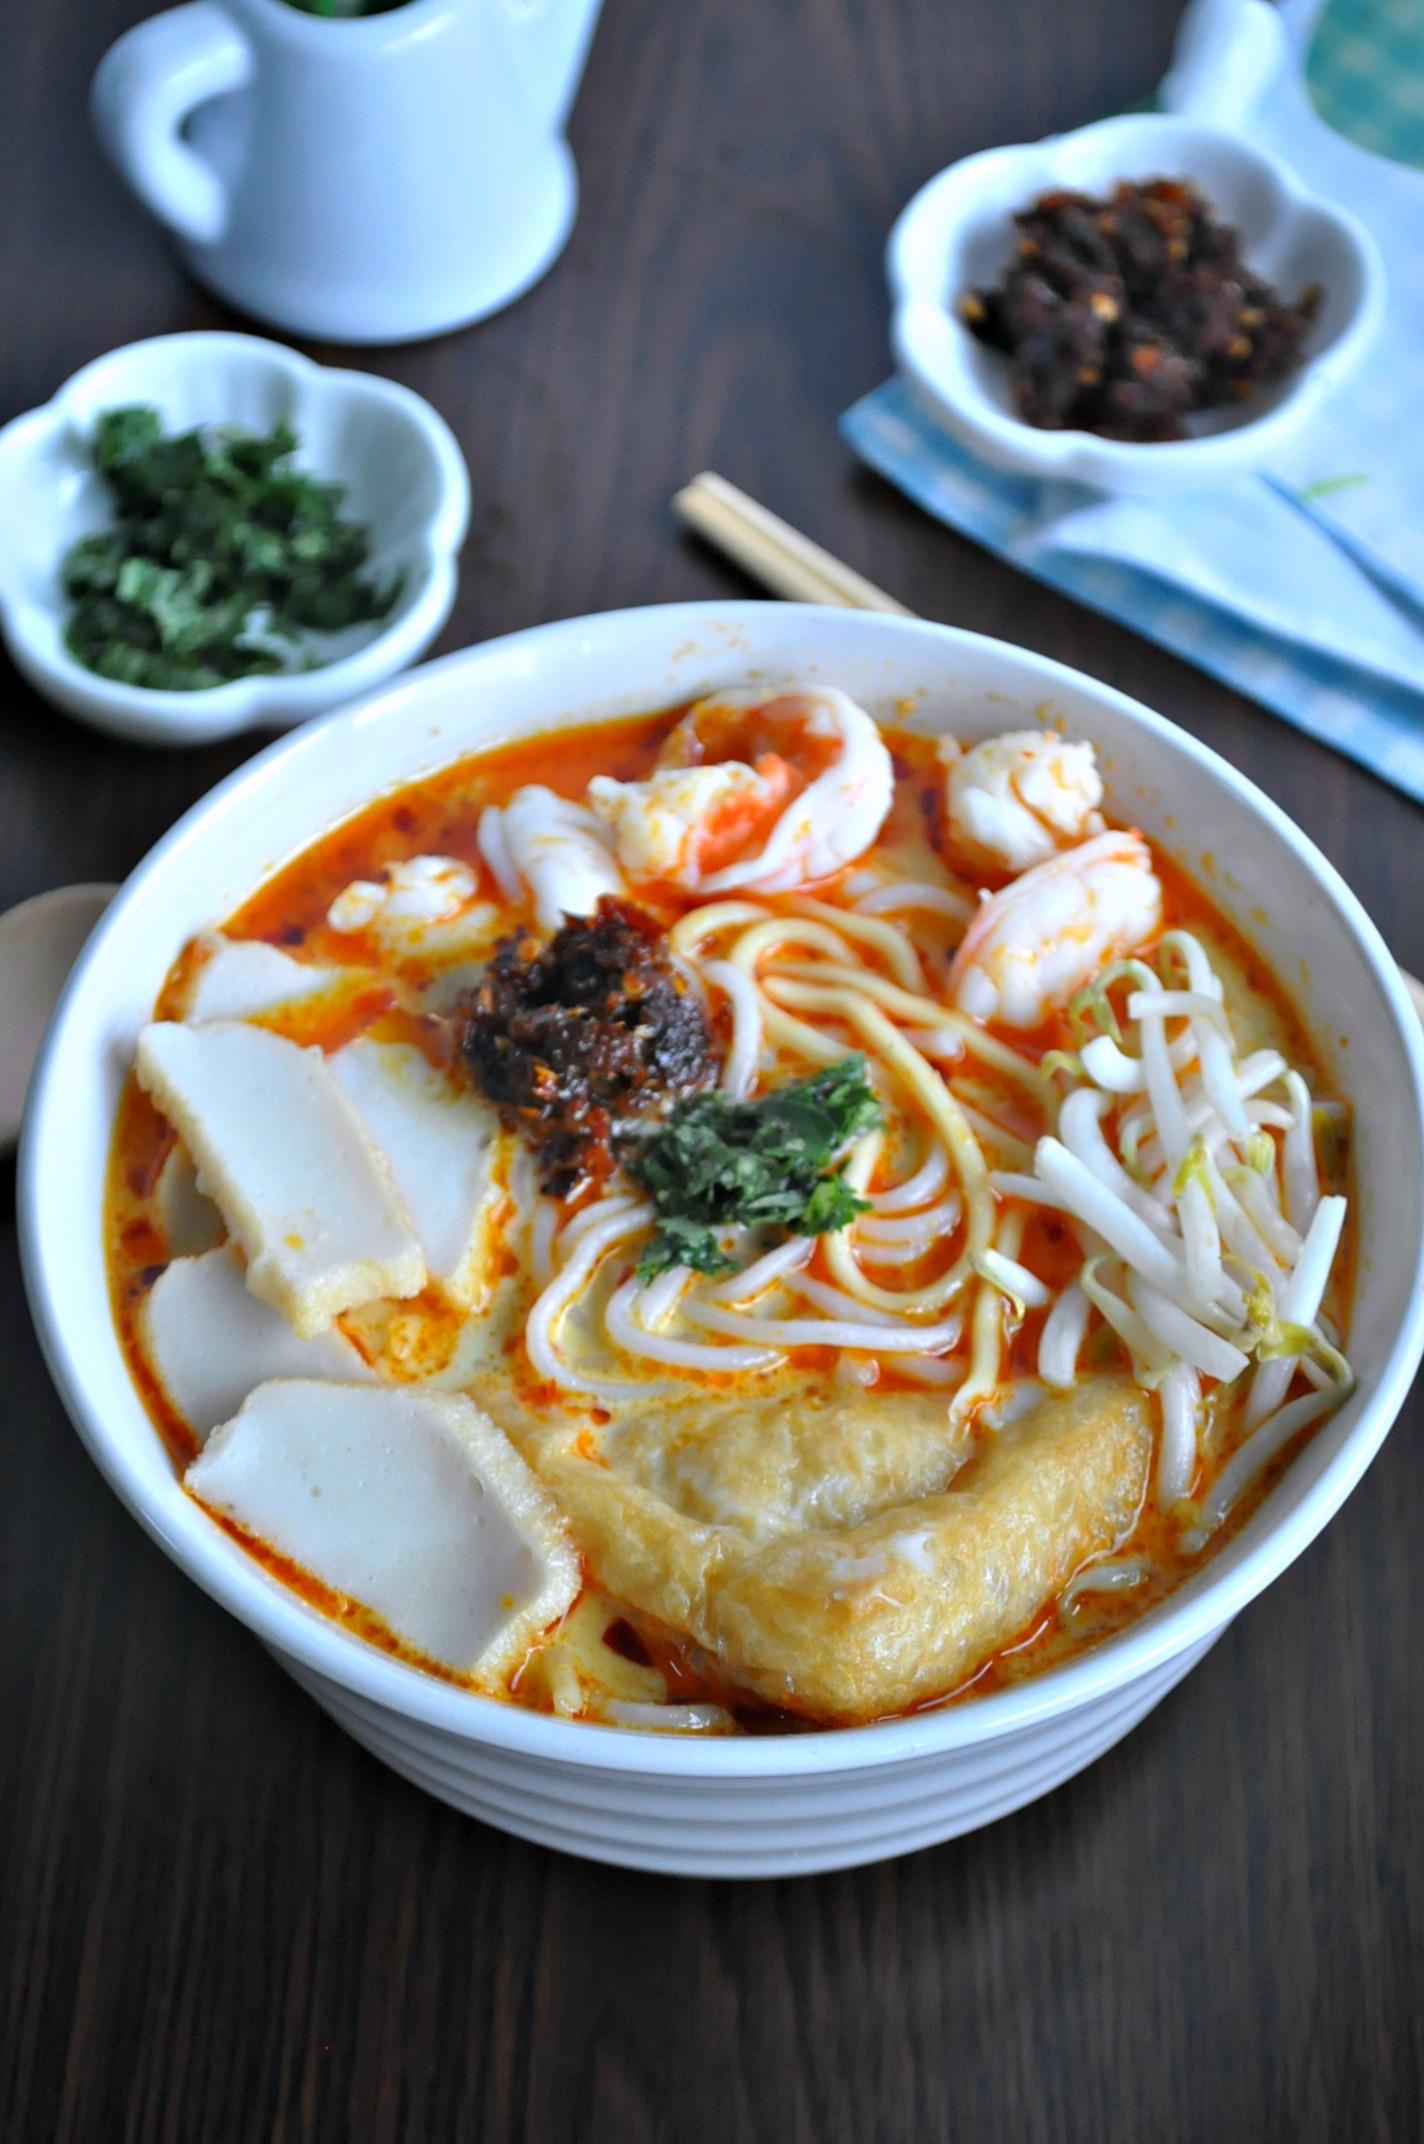 Singapore Laksa 新加坡叻沙 – Eat What Tonight